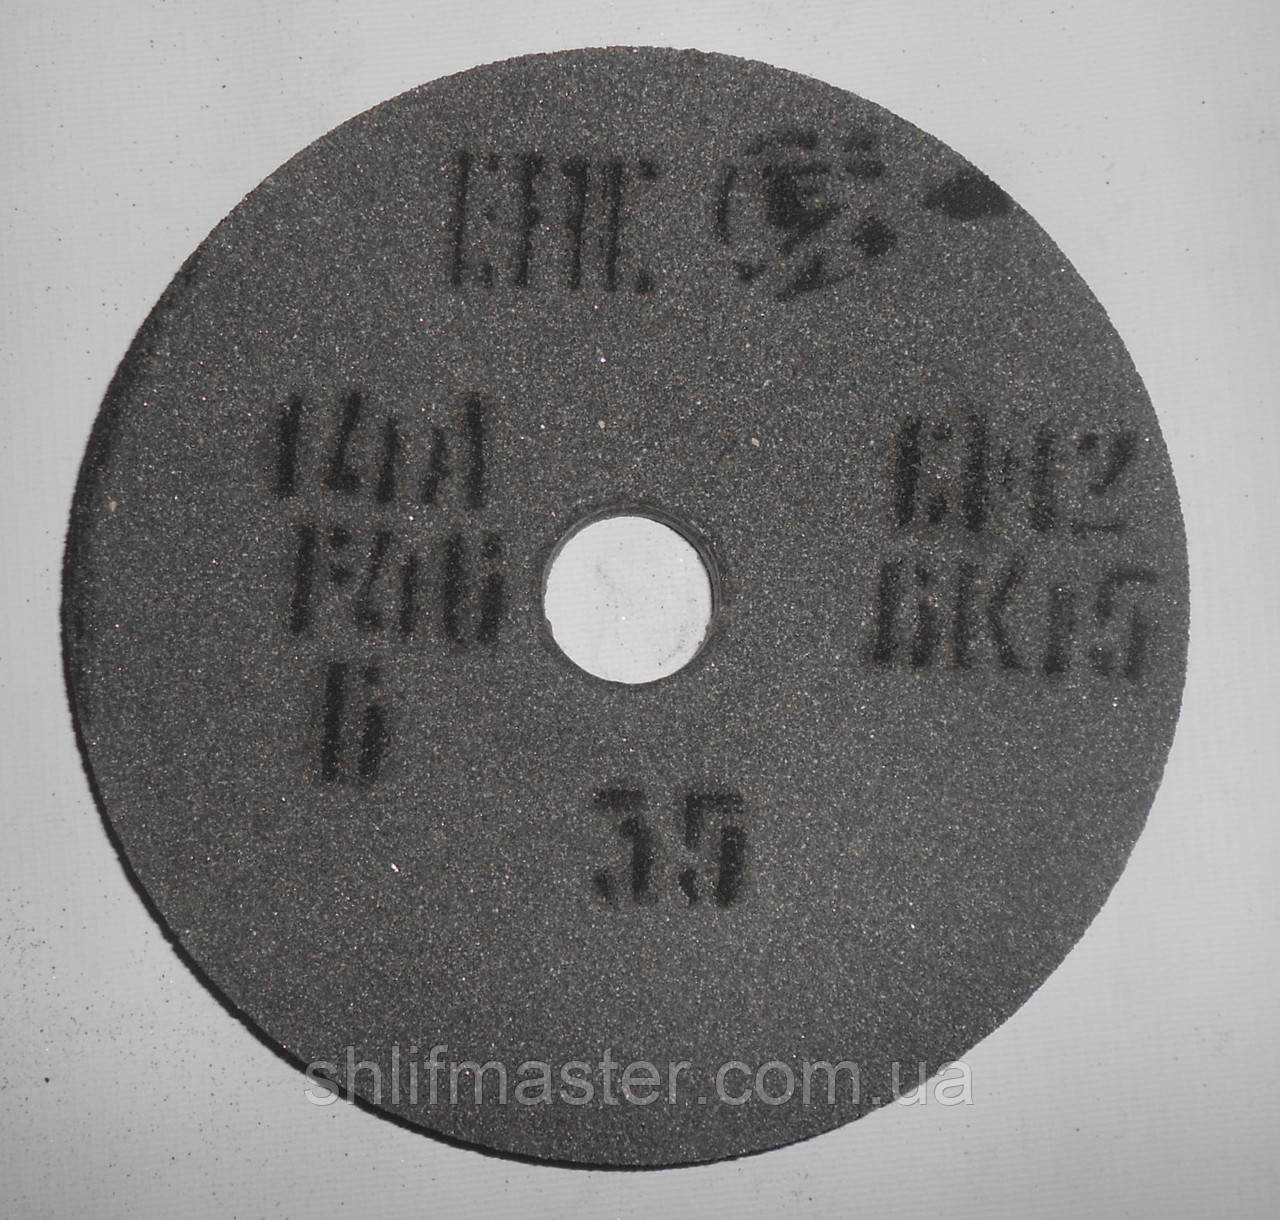 Круг шлифовальный электрокорунд серый керамика 14А ПП 175х25х32 40 СМ/F40 K